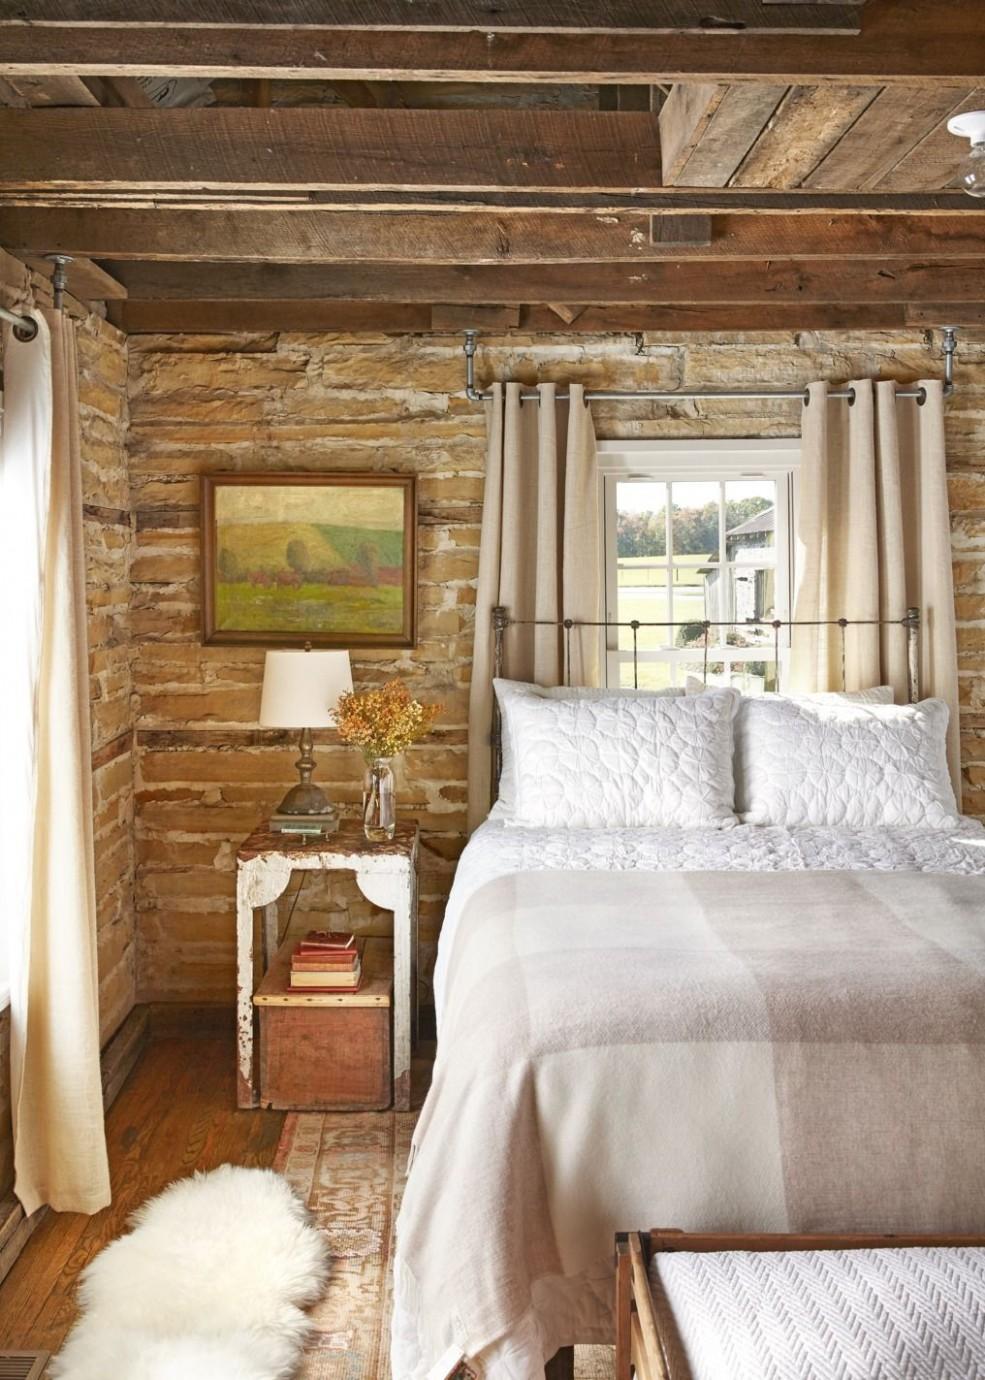 12 Rustic Bedroom Ideas - Rustic Decorating Ideas - Bedroom Ideas Rustic